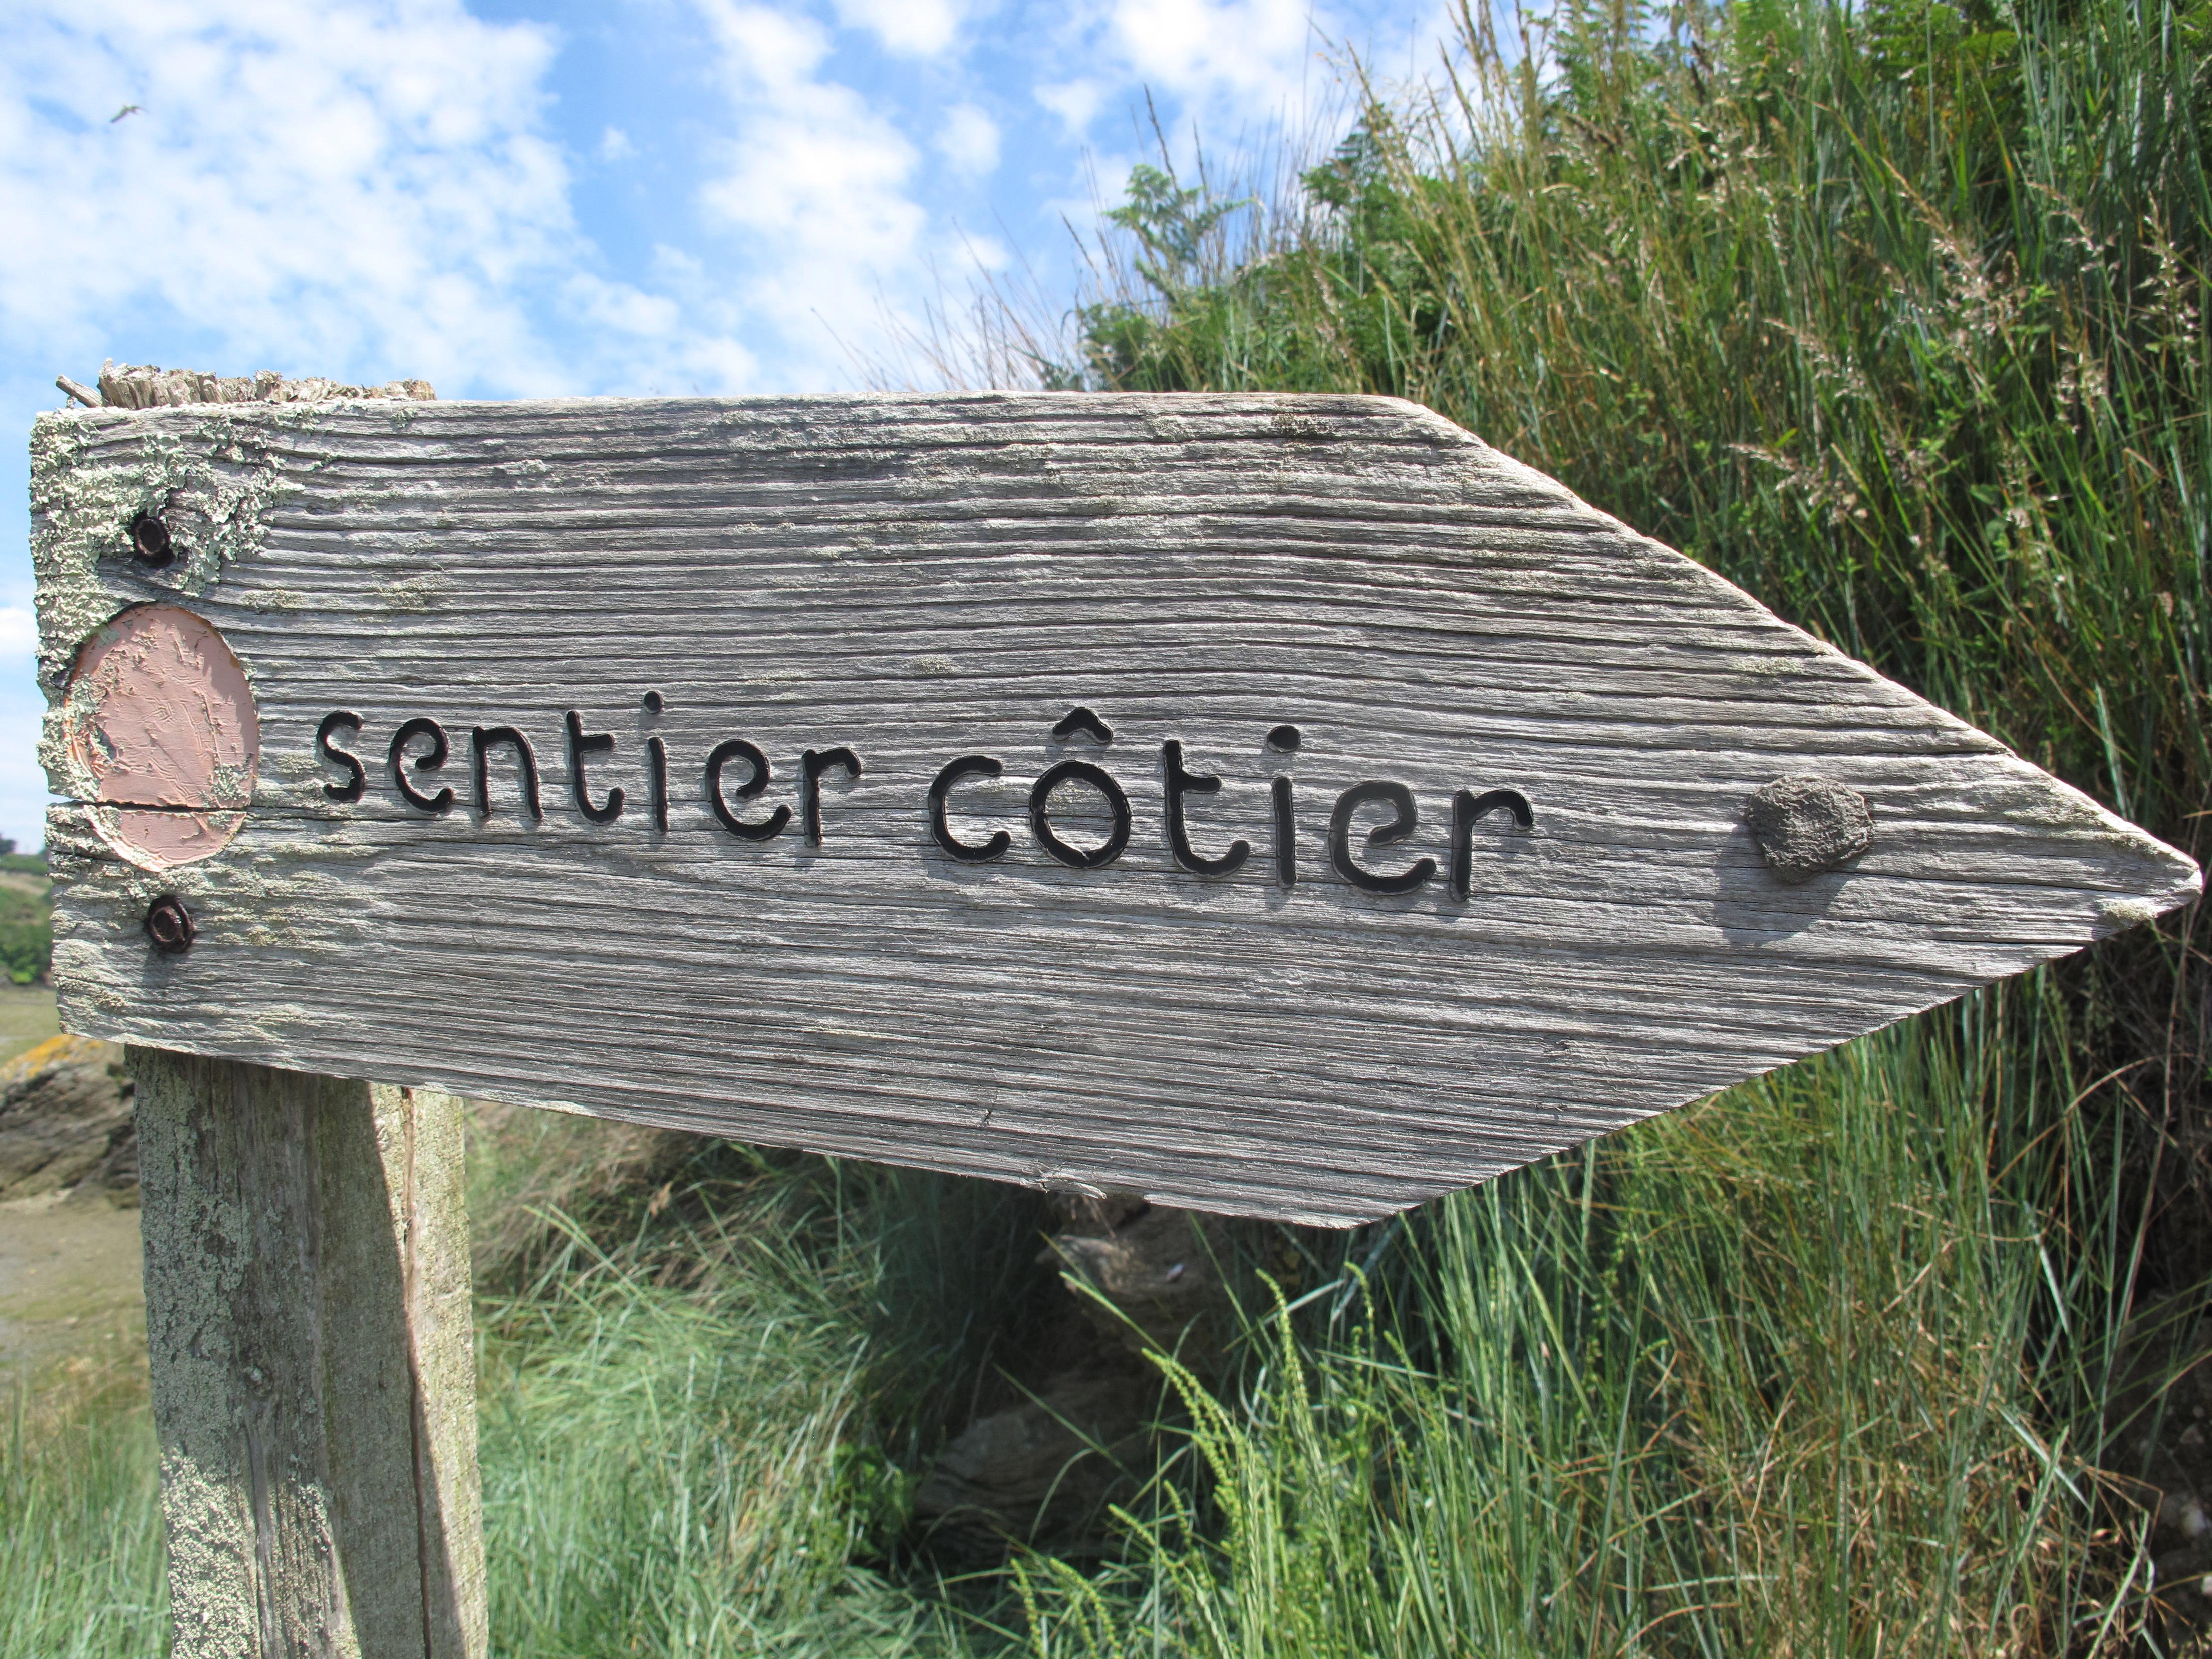 Panneau Sentier côtier